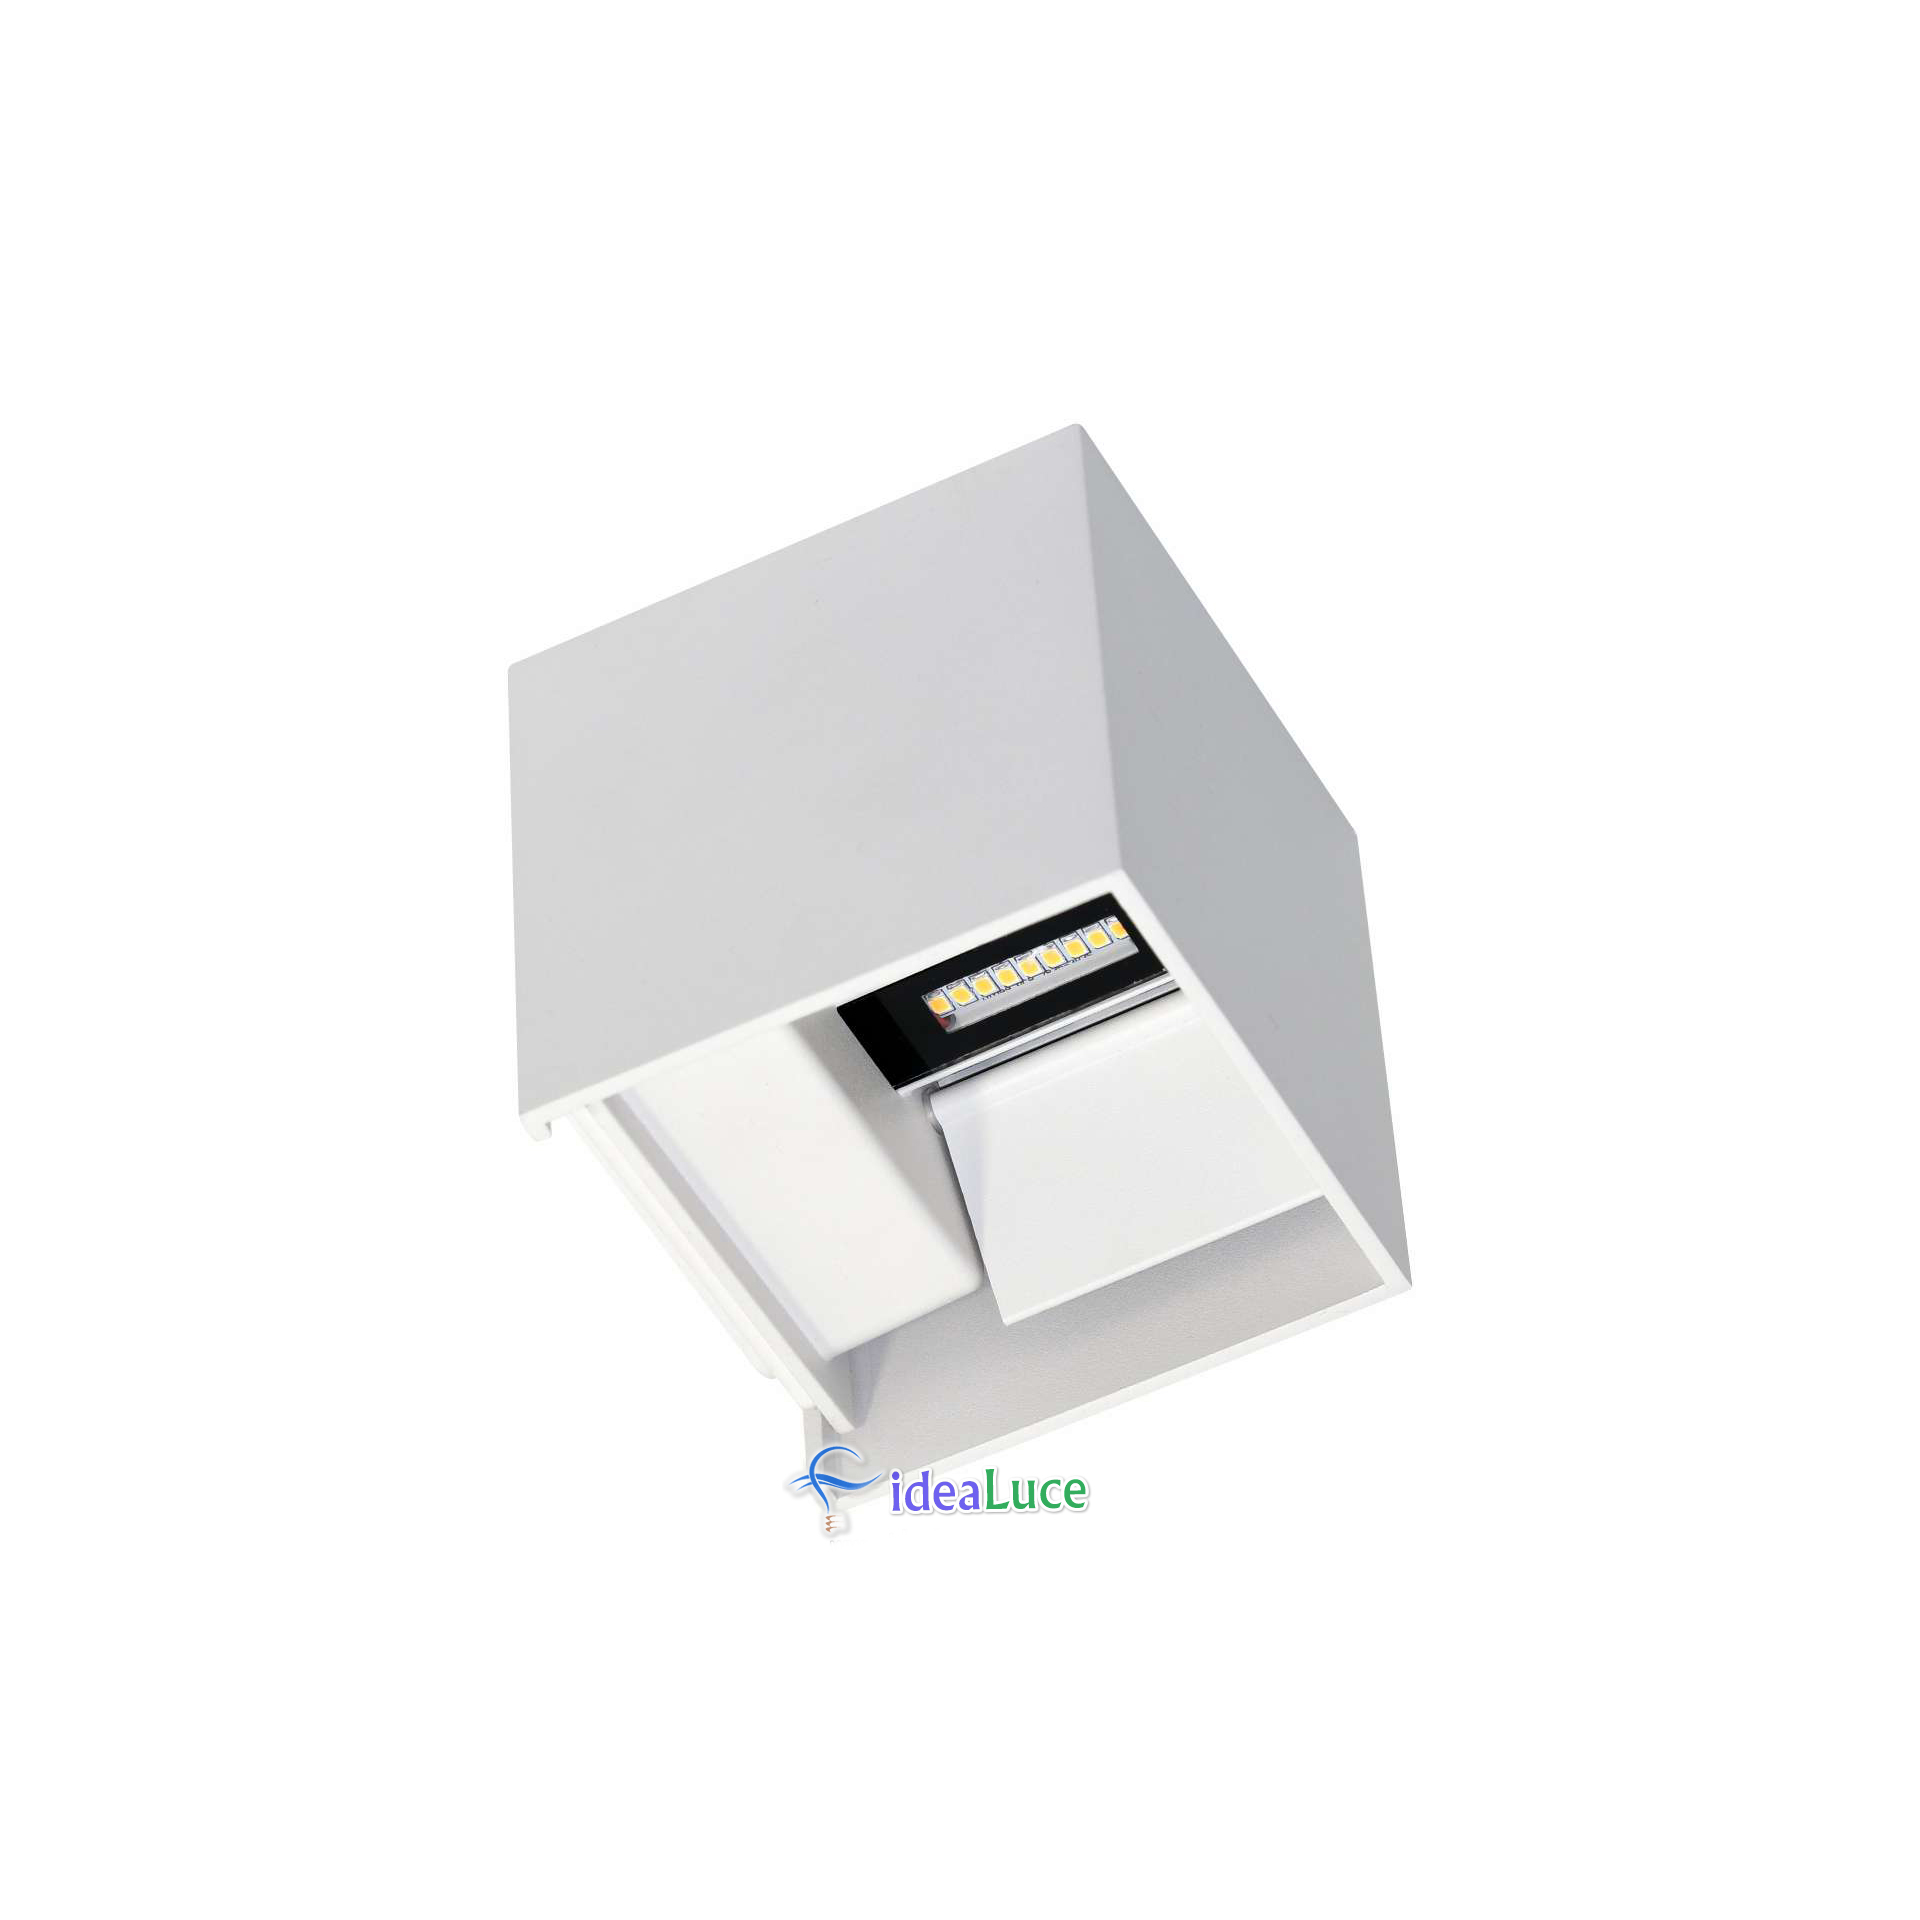 Lampada da Parete Applique da esterno Beneito Faure Led bianco Lek 2700K 4303